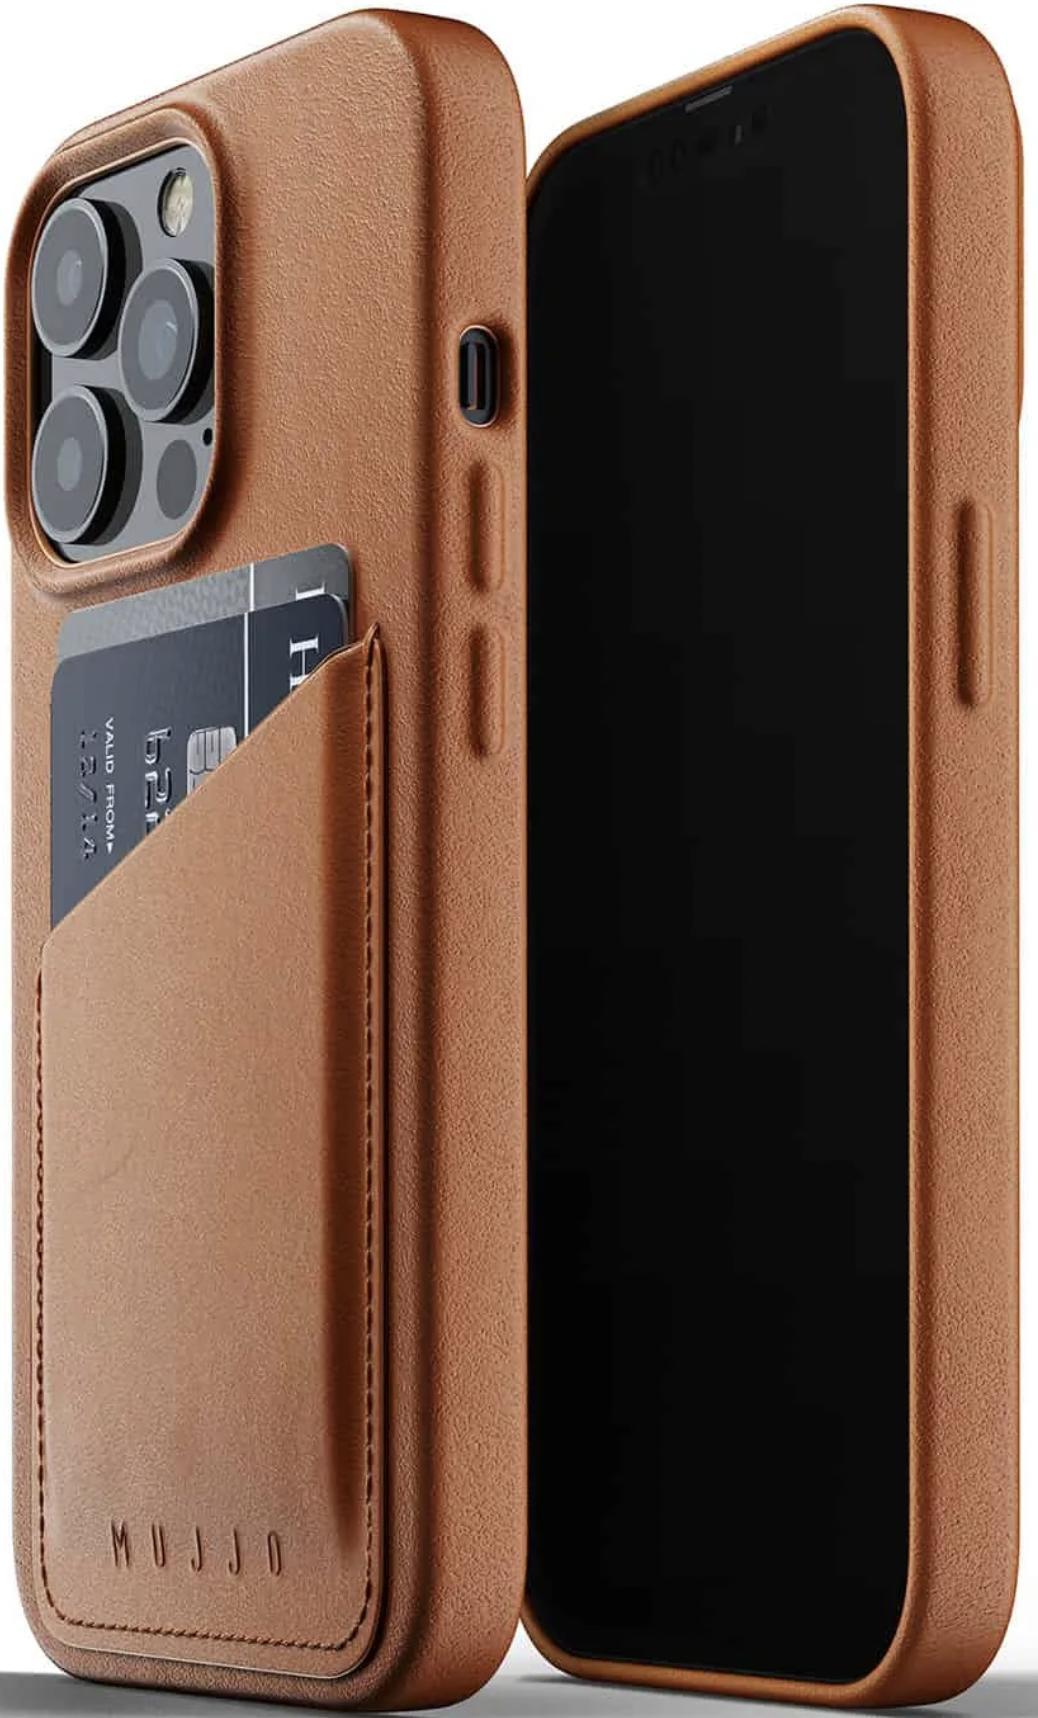 Mujjo Leather Wallet Case Iphone 13 Pro